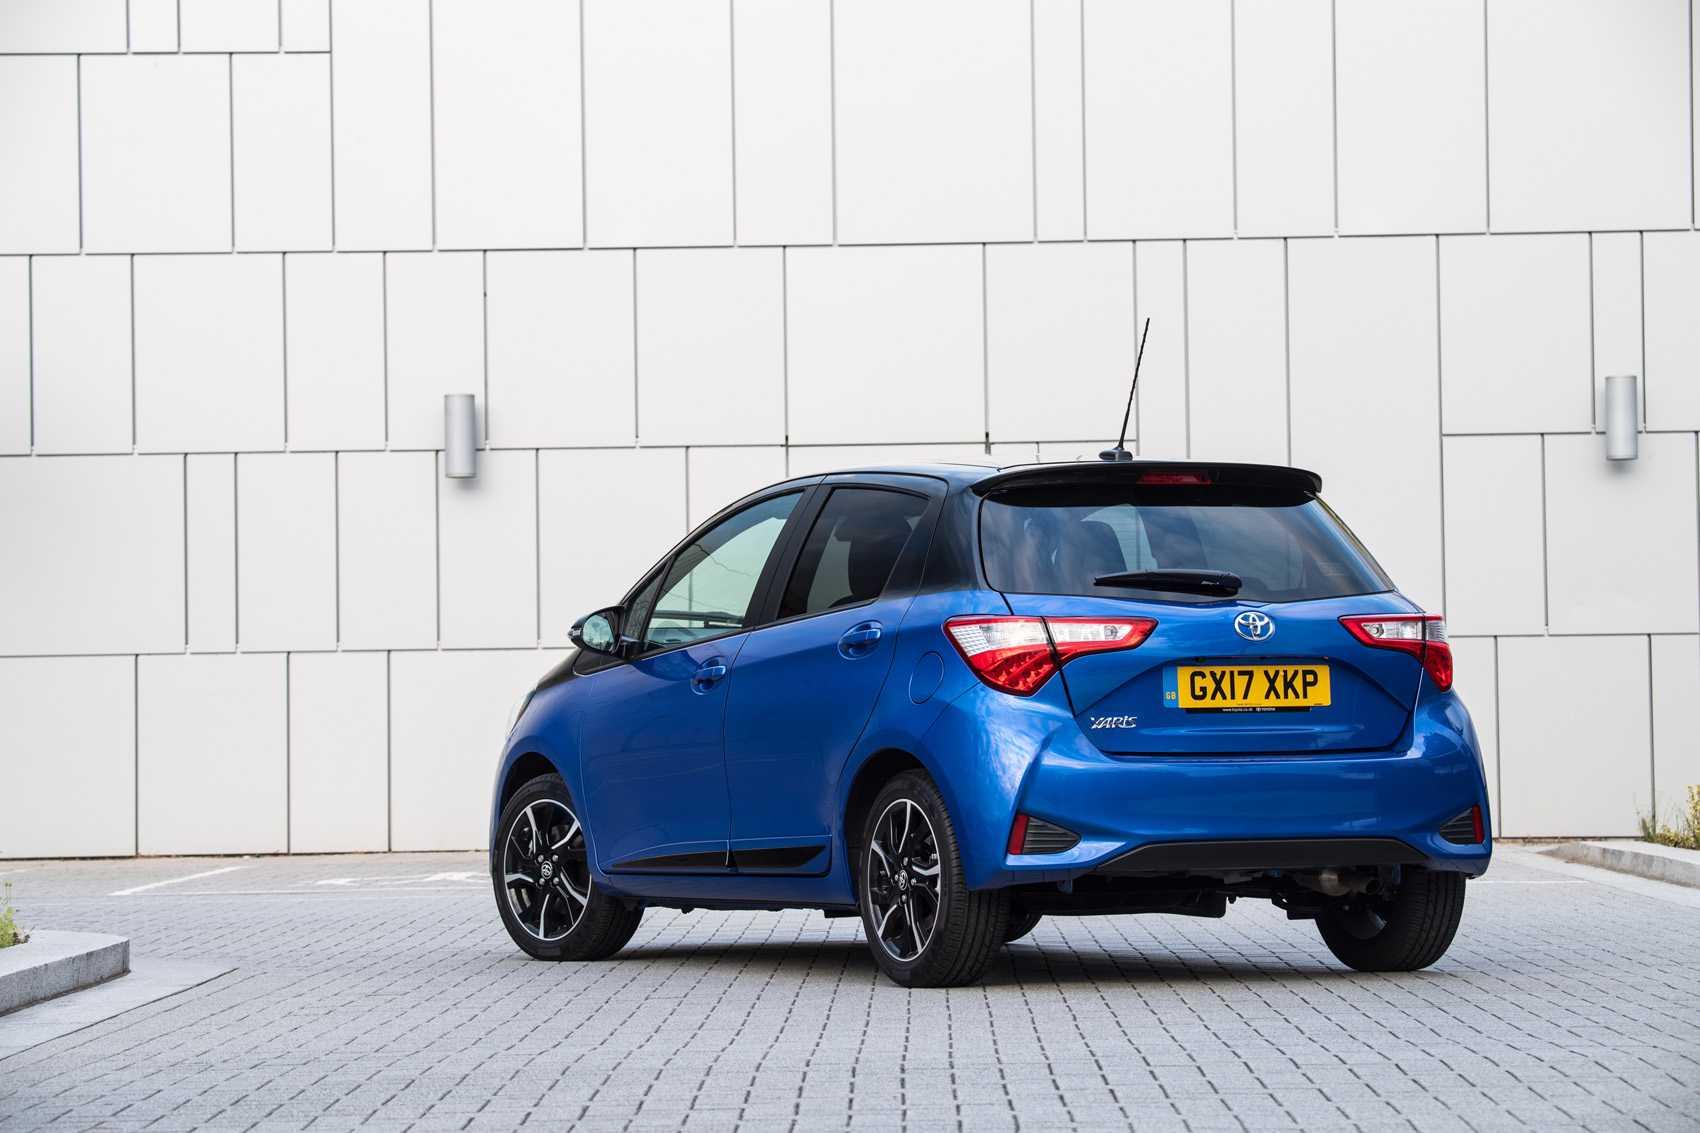 Toyota gr yaris 2020, фото, цена, комплектации и характеристики